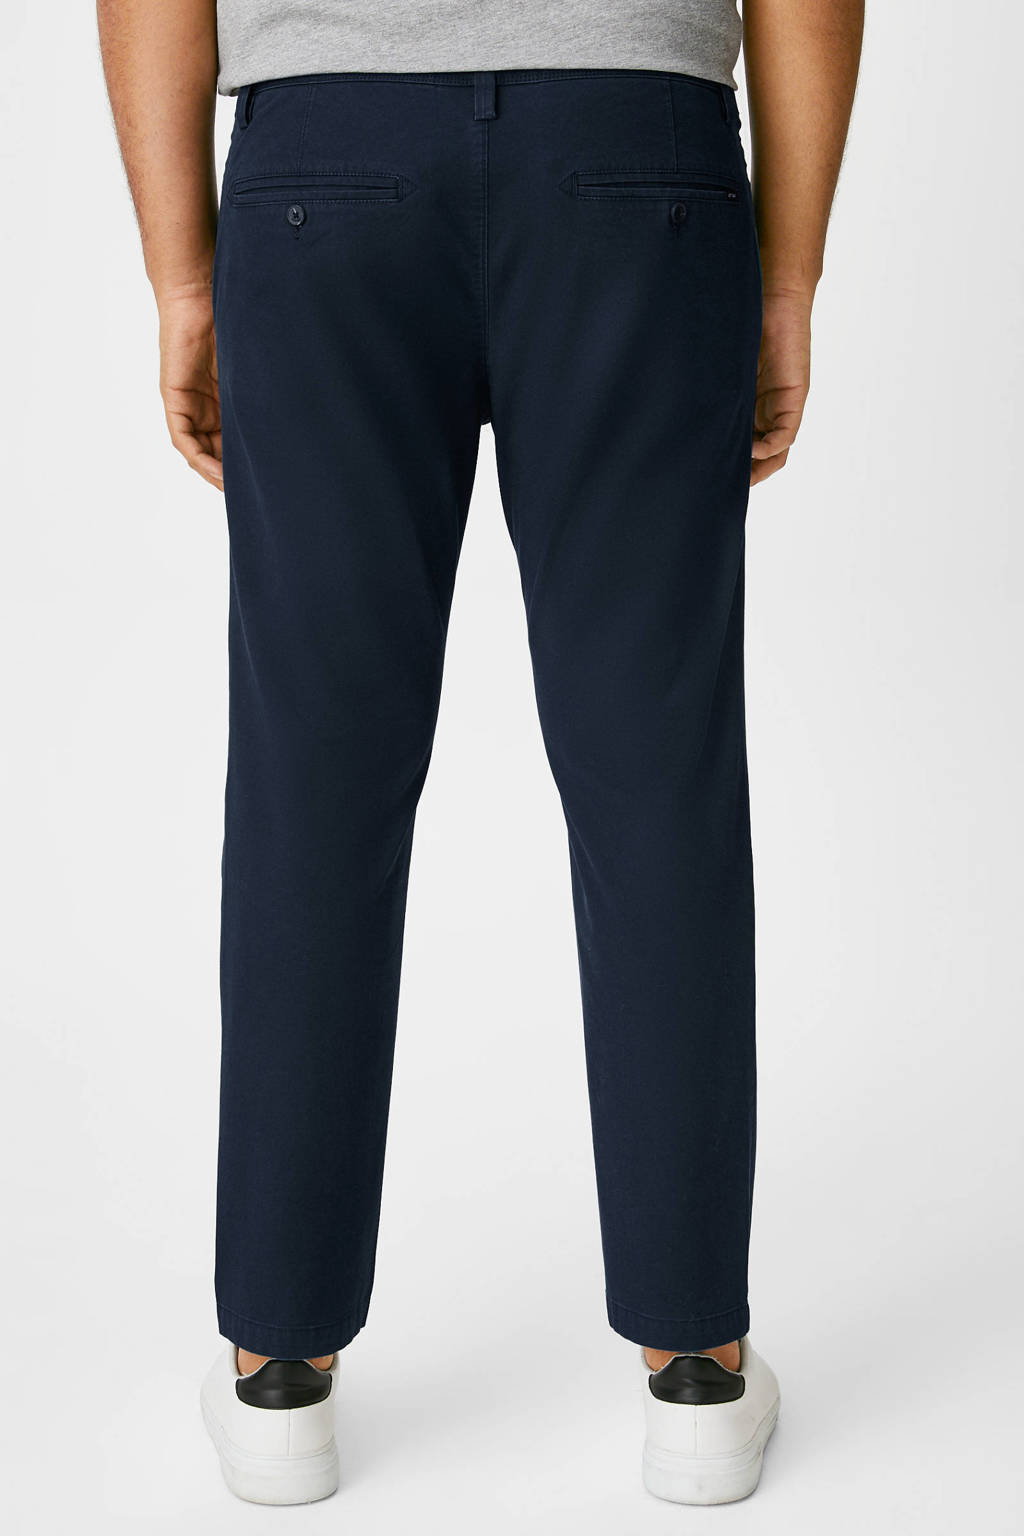 C&A XL slim fit chino donkerblauw, Donkerblauw